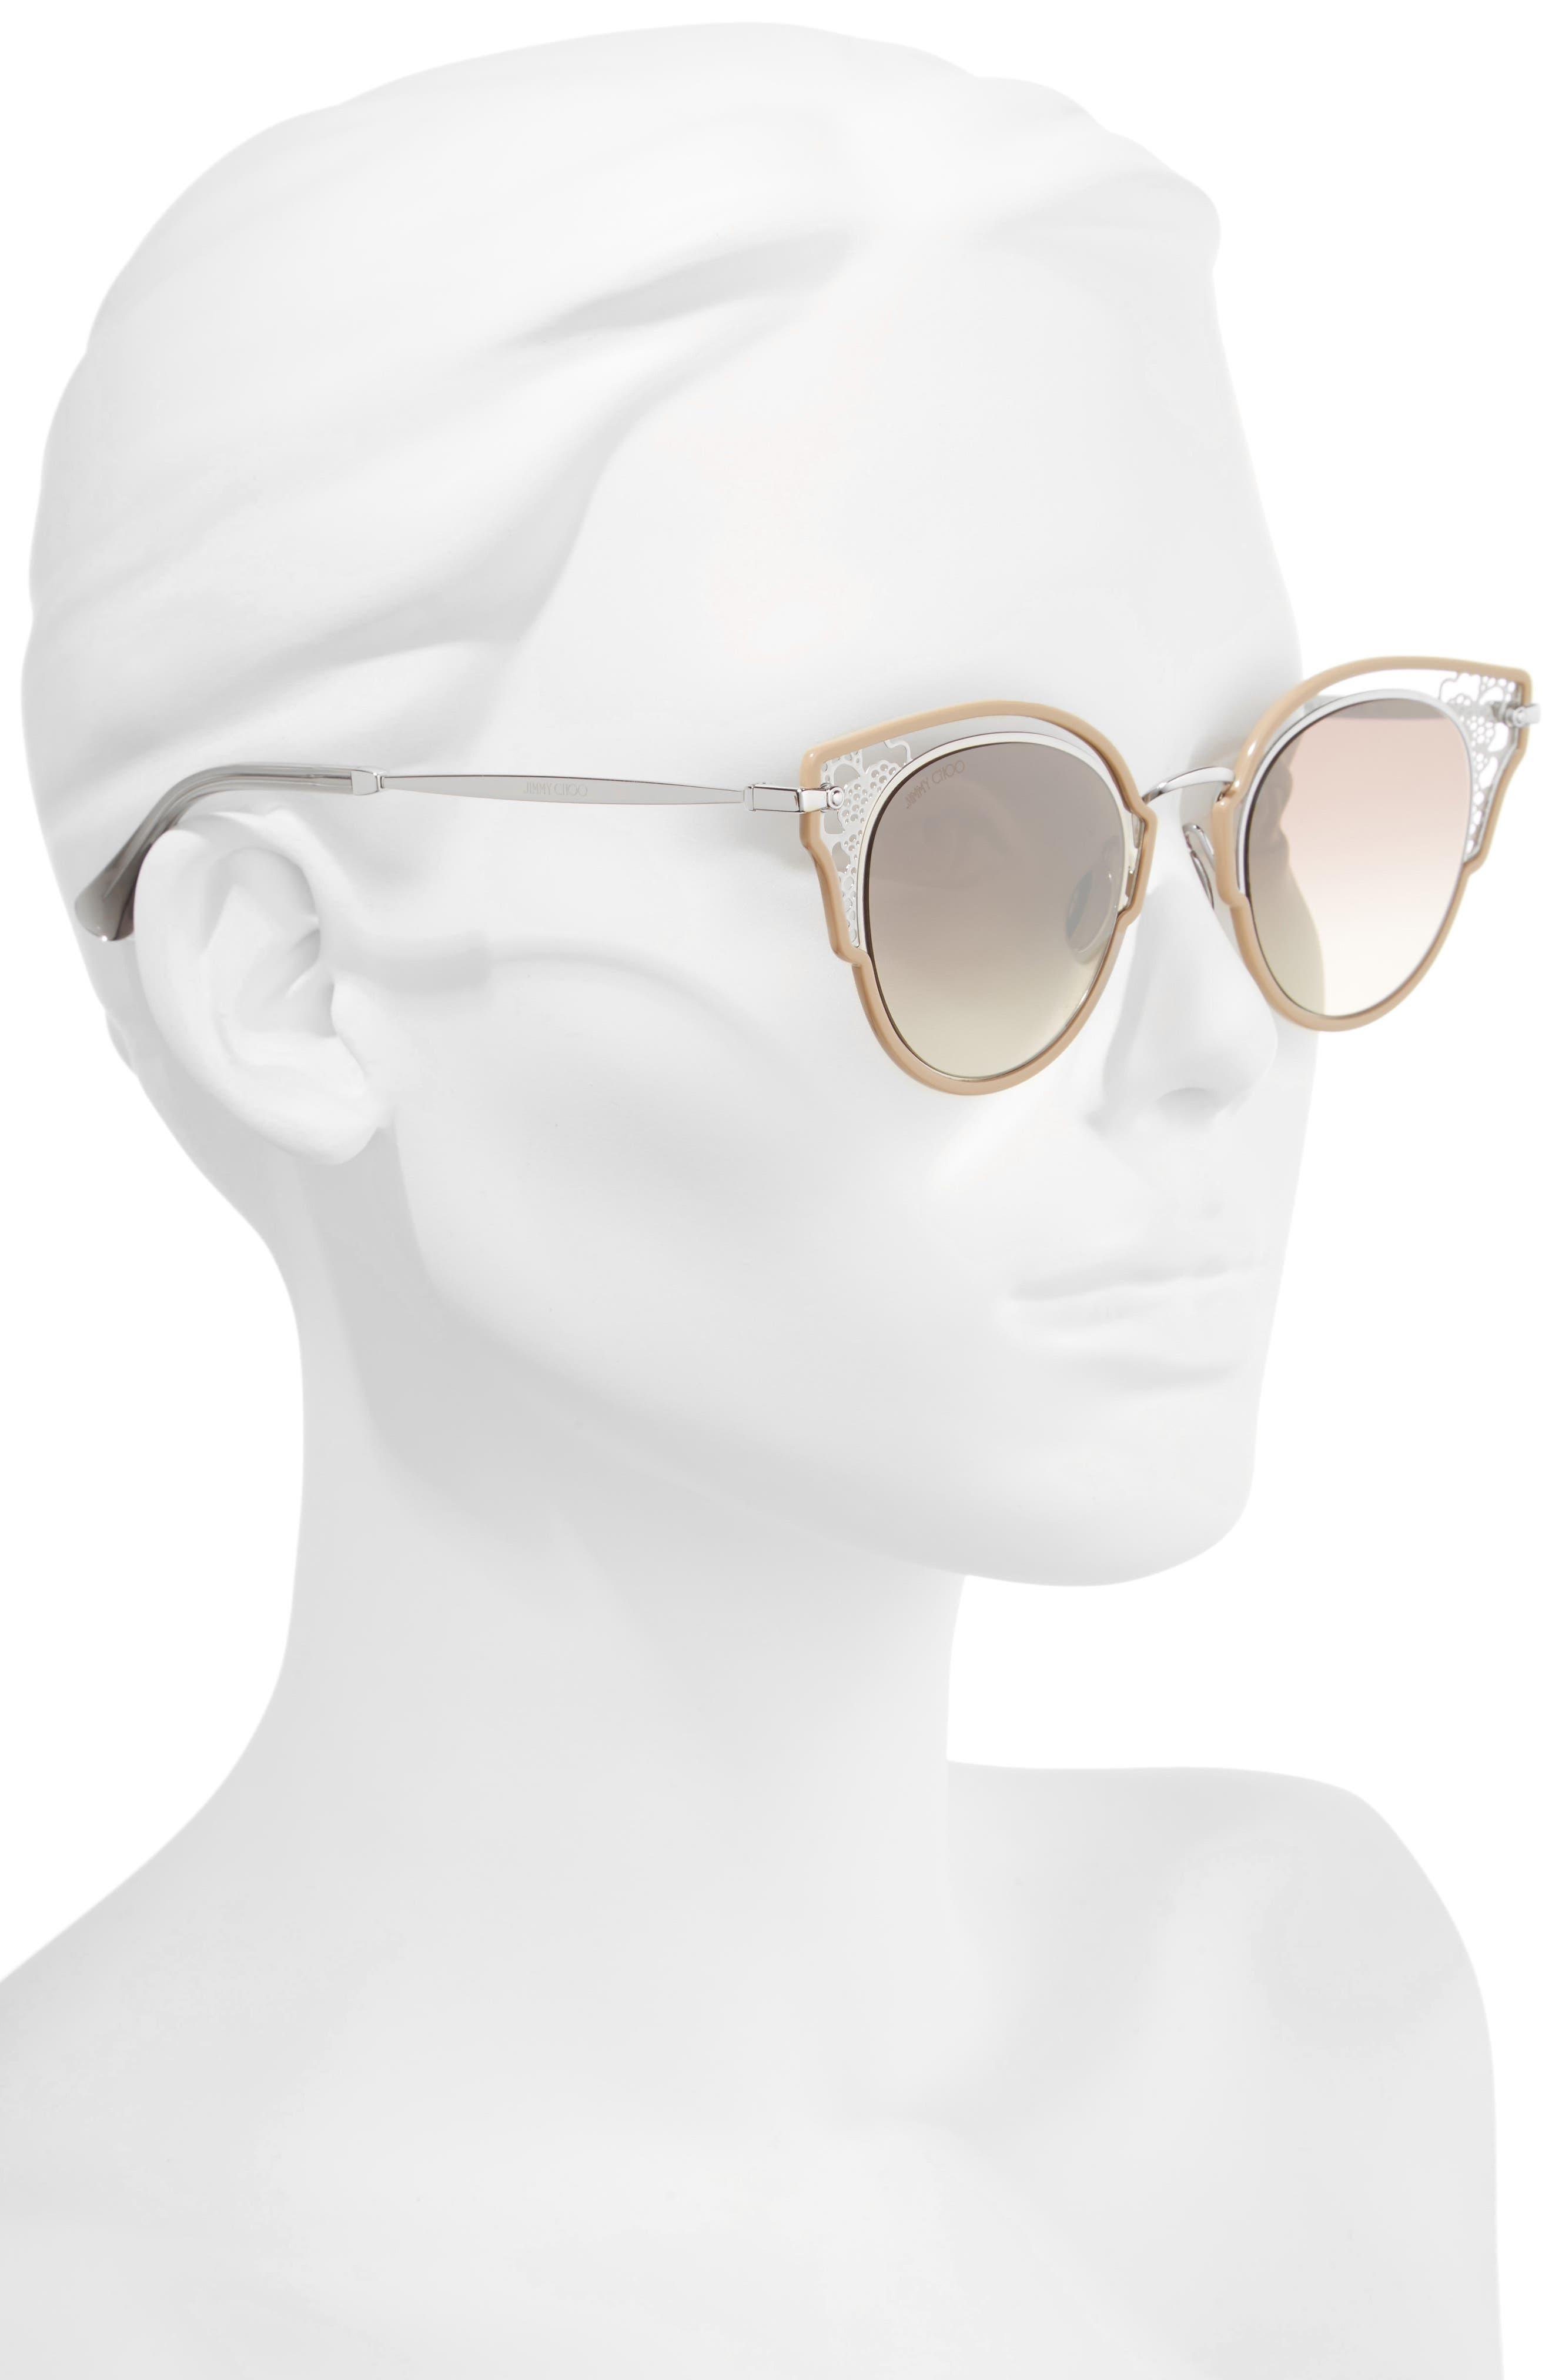 Dhelias 48mm Cat Eye Sunglasses,                             Alternate thumbnail 2, color,                             Nude Palladium